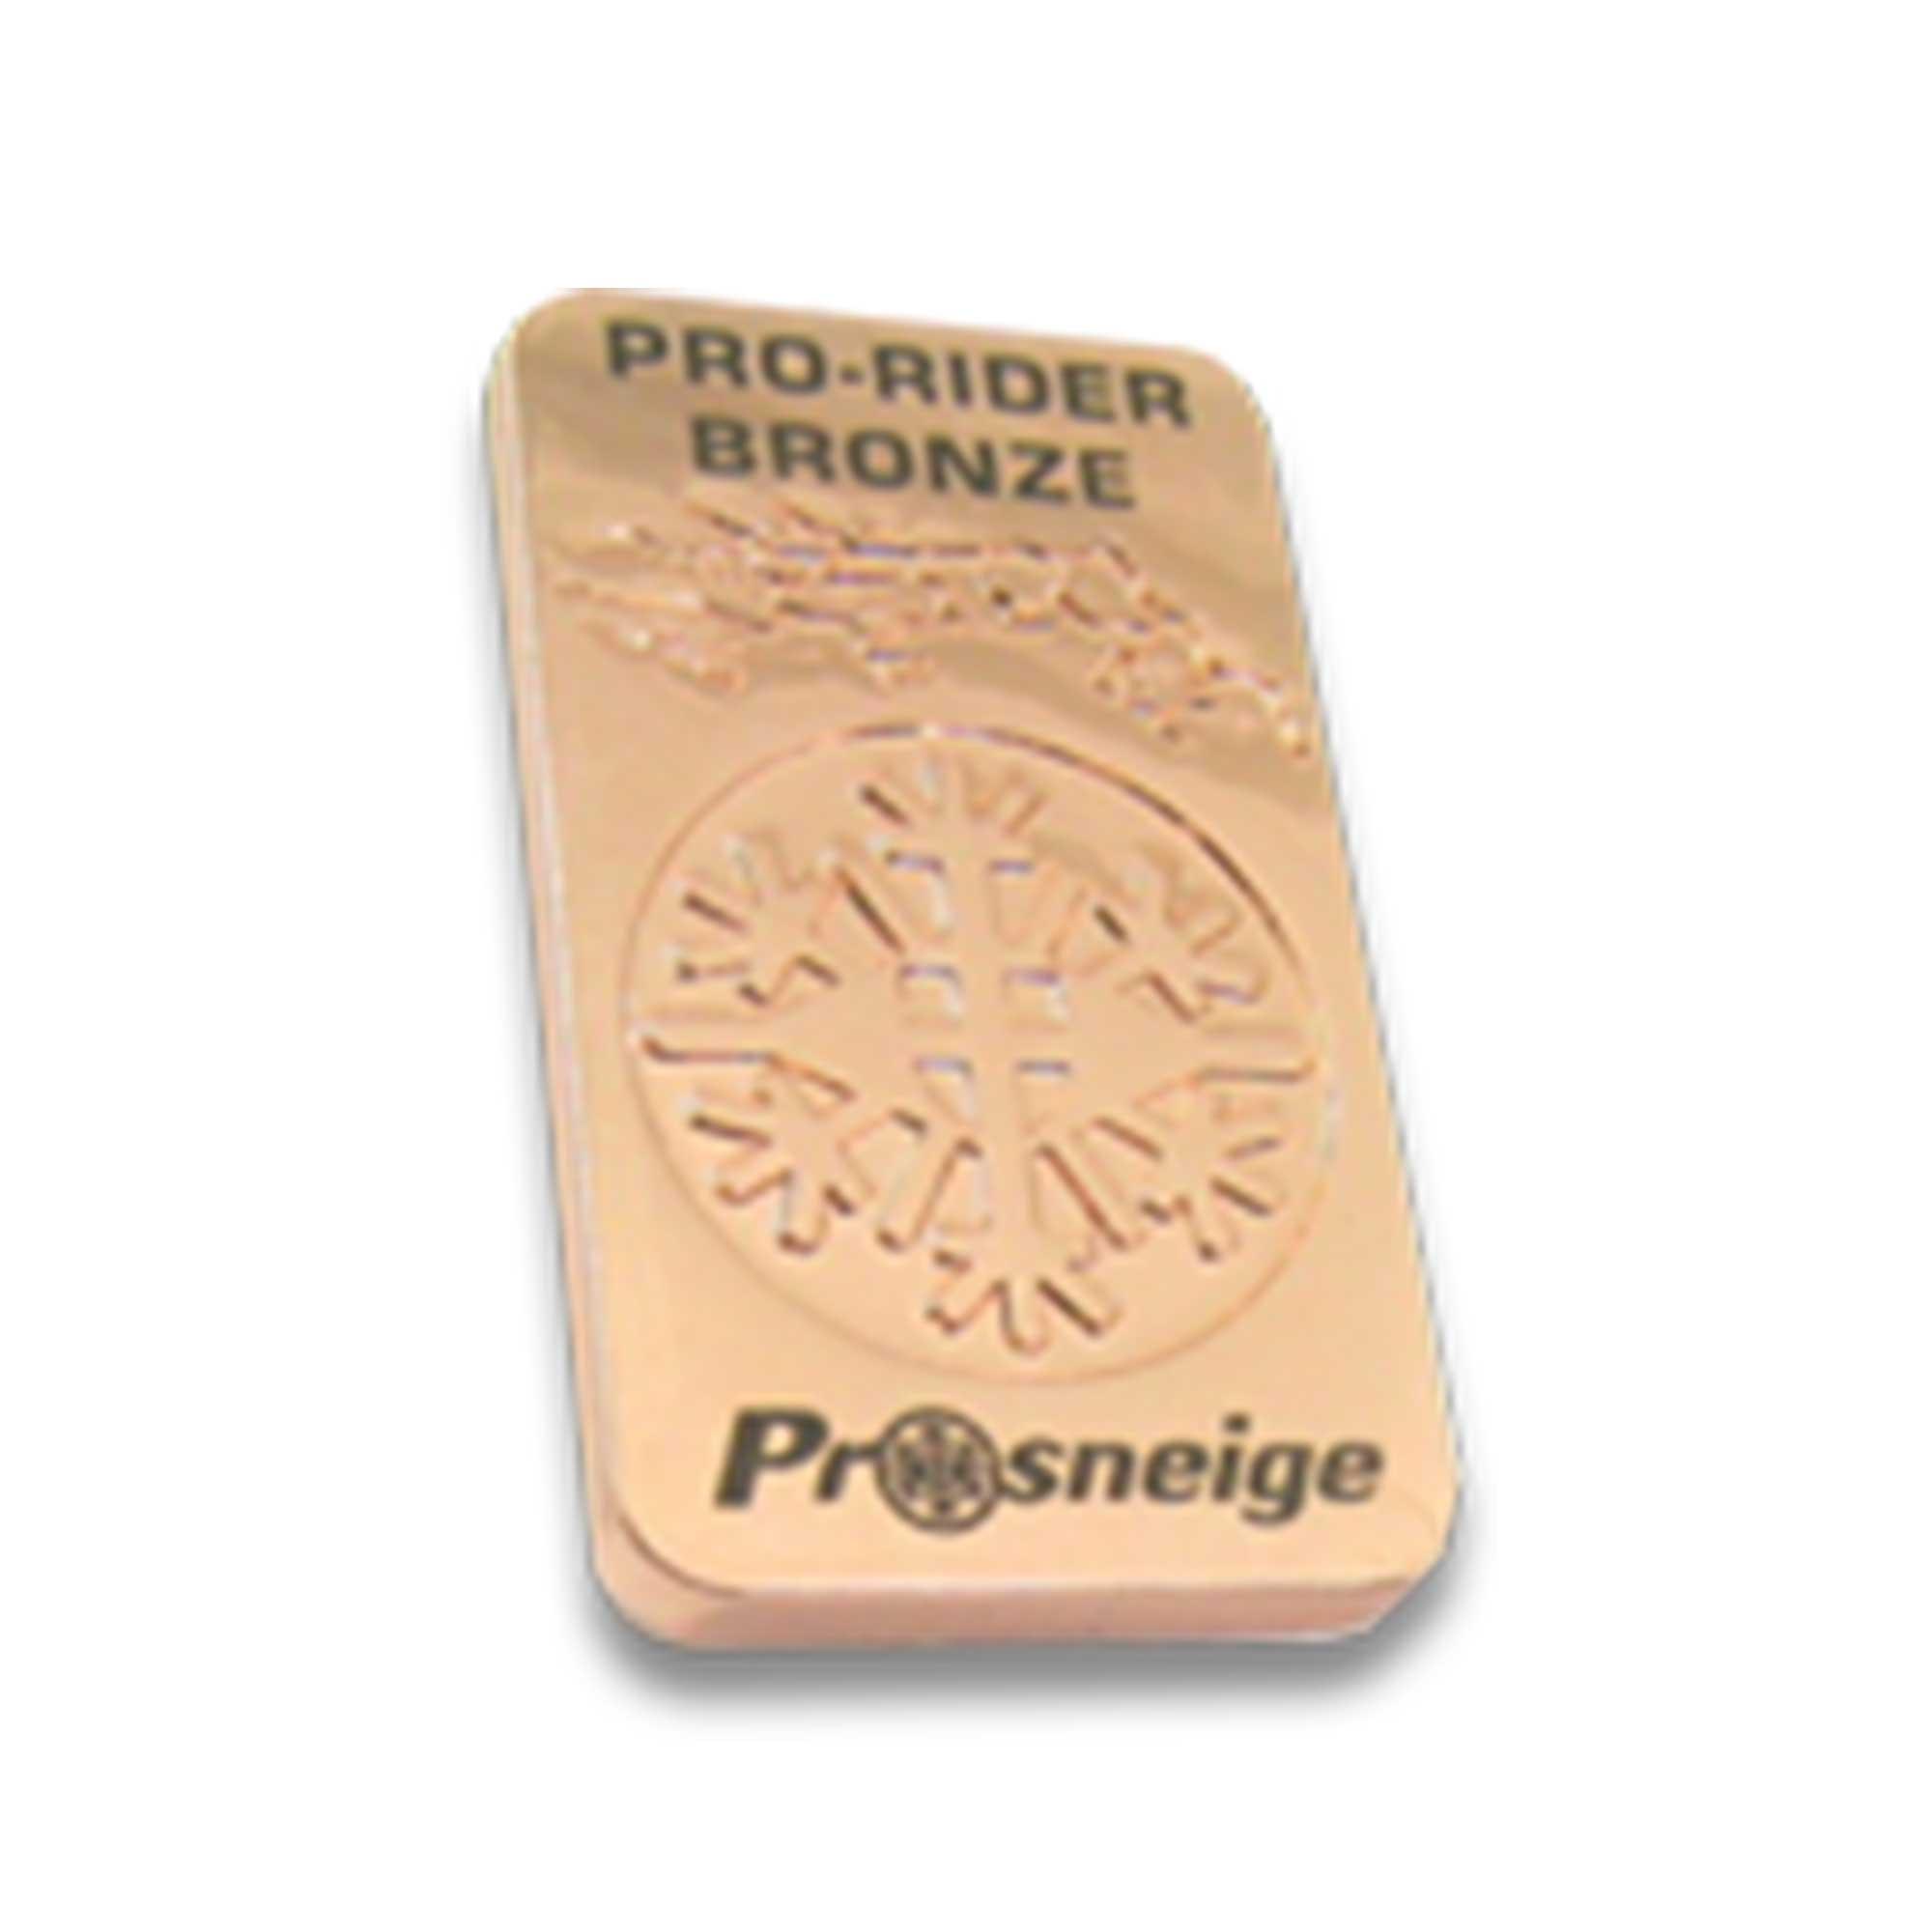 pro rider bronze